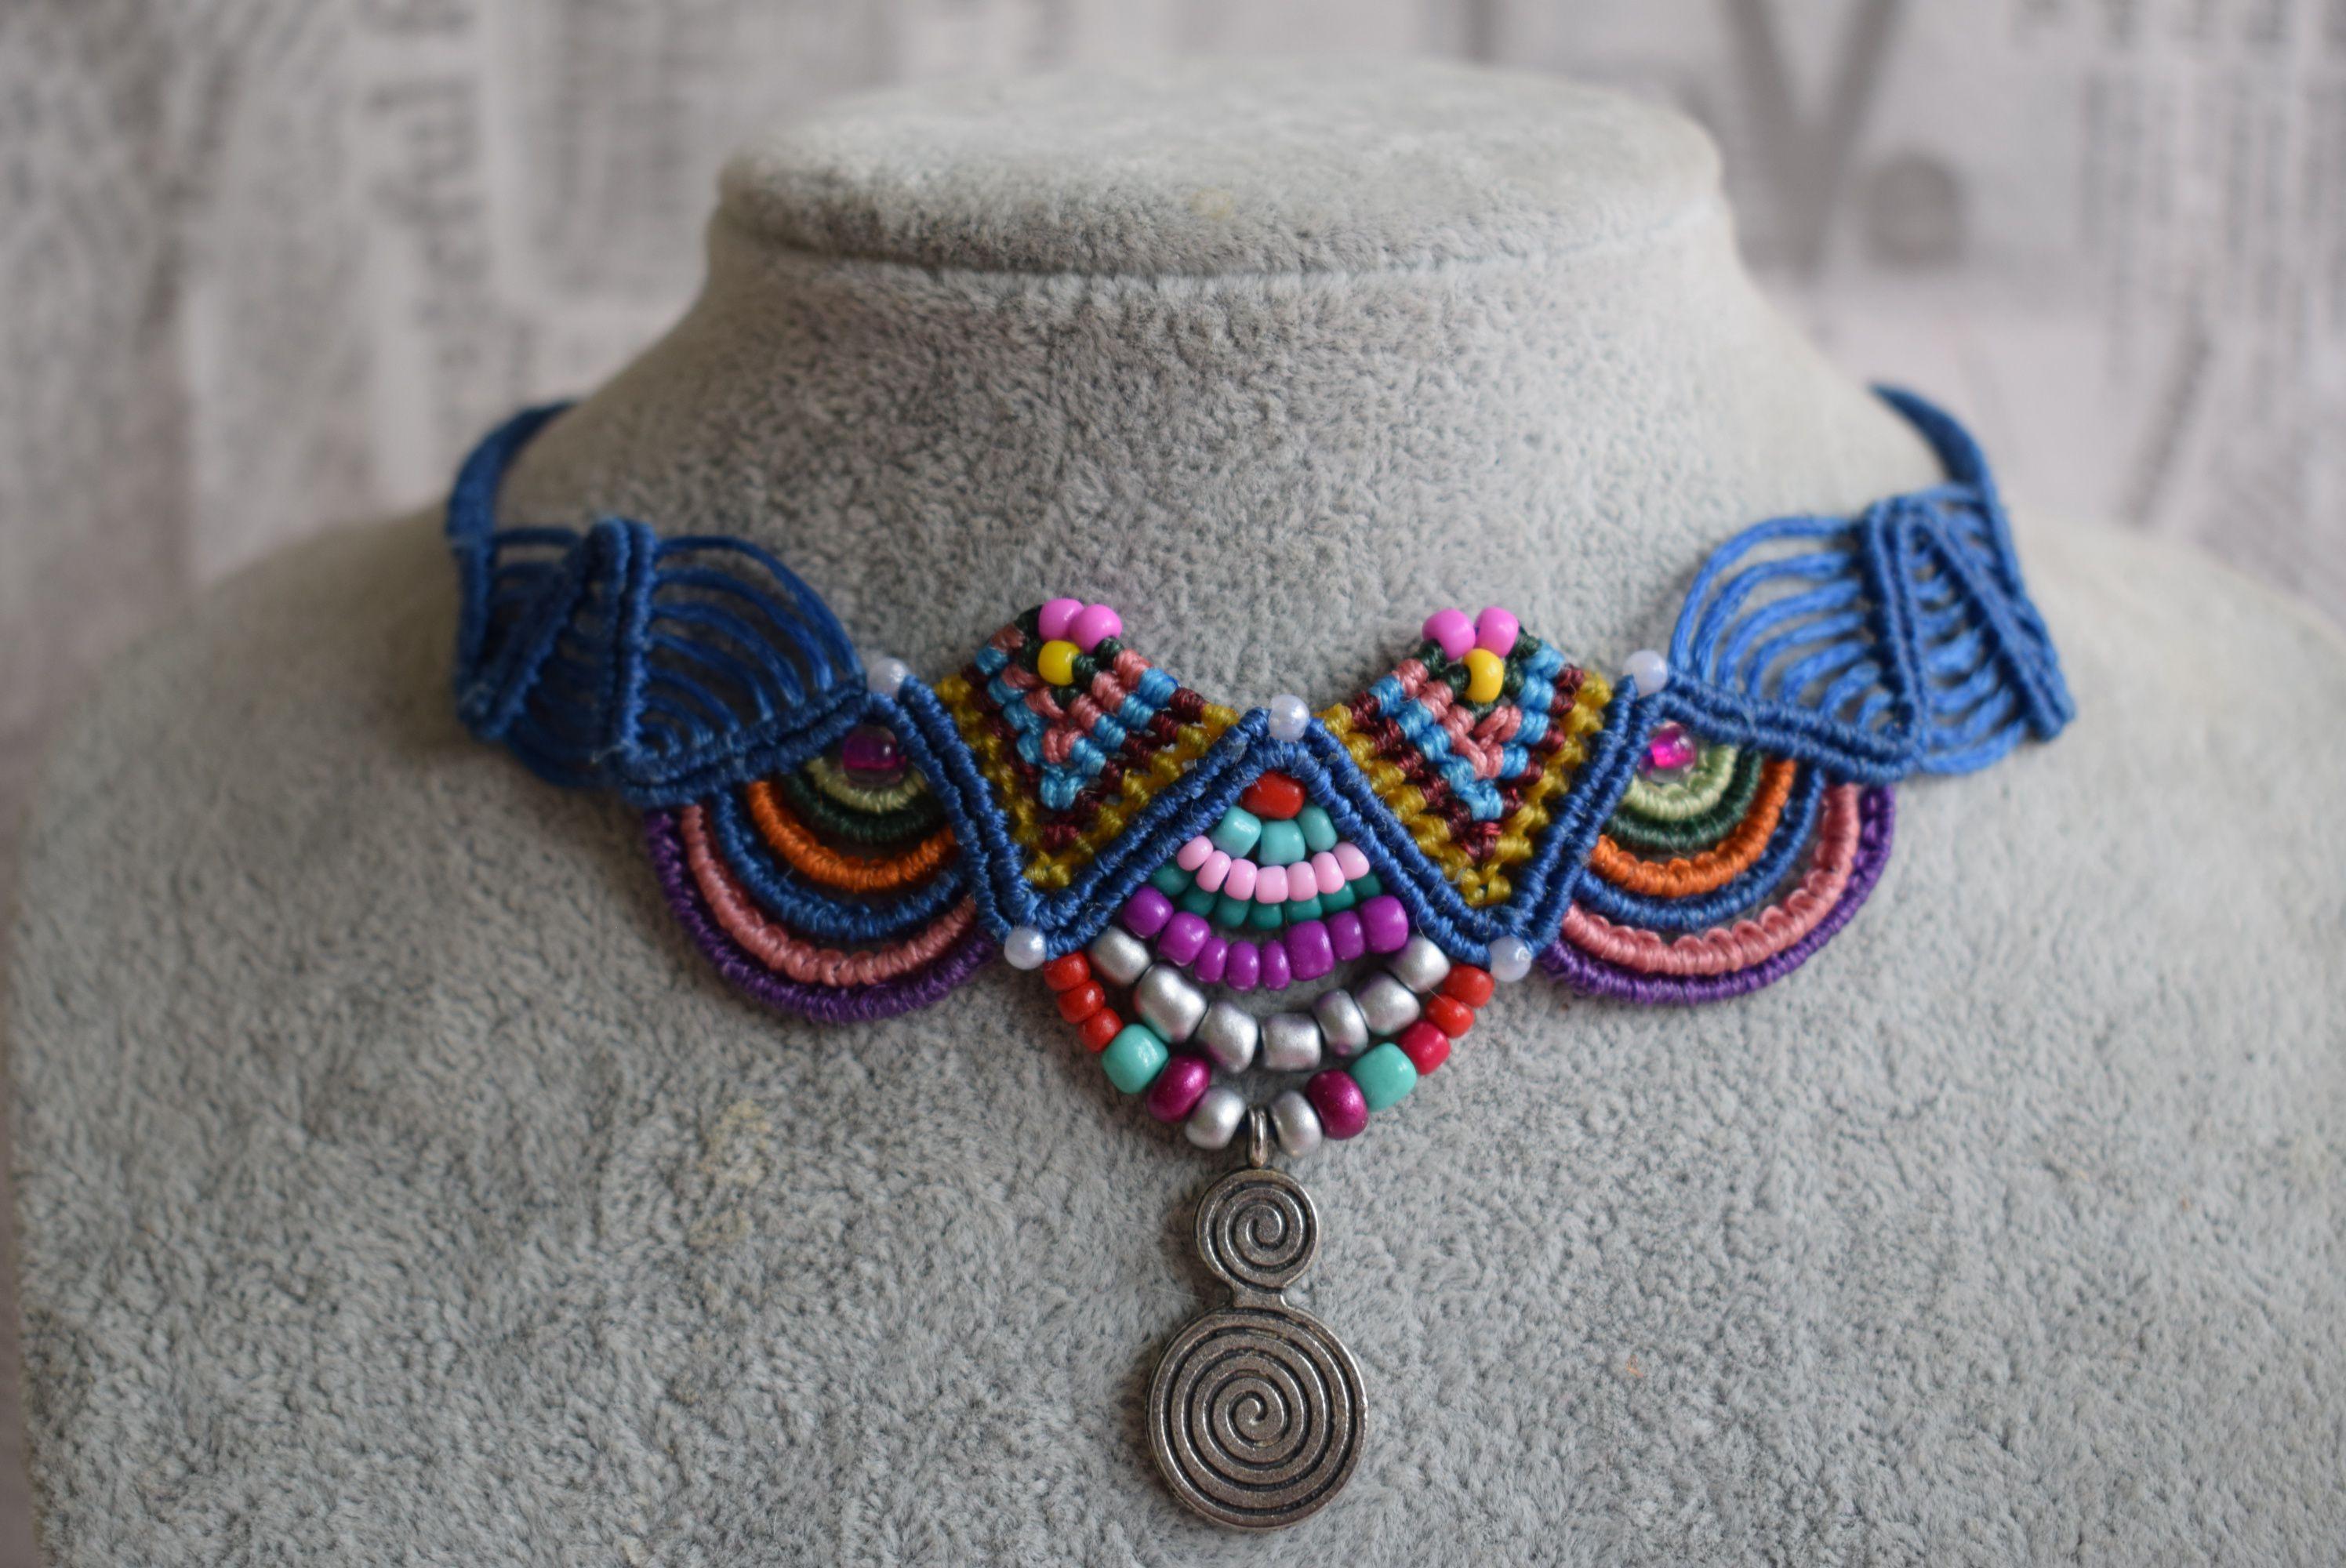 handmade hand gift set bracelets unique bracelet necklace jewelry blue braided friendship macrame woven hippie sets bohochic anklet work